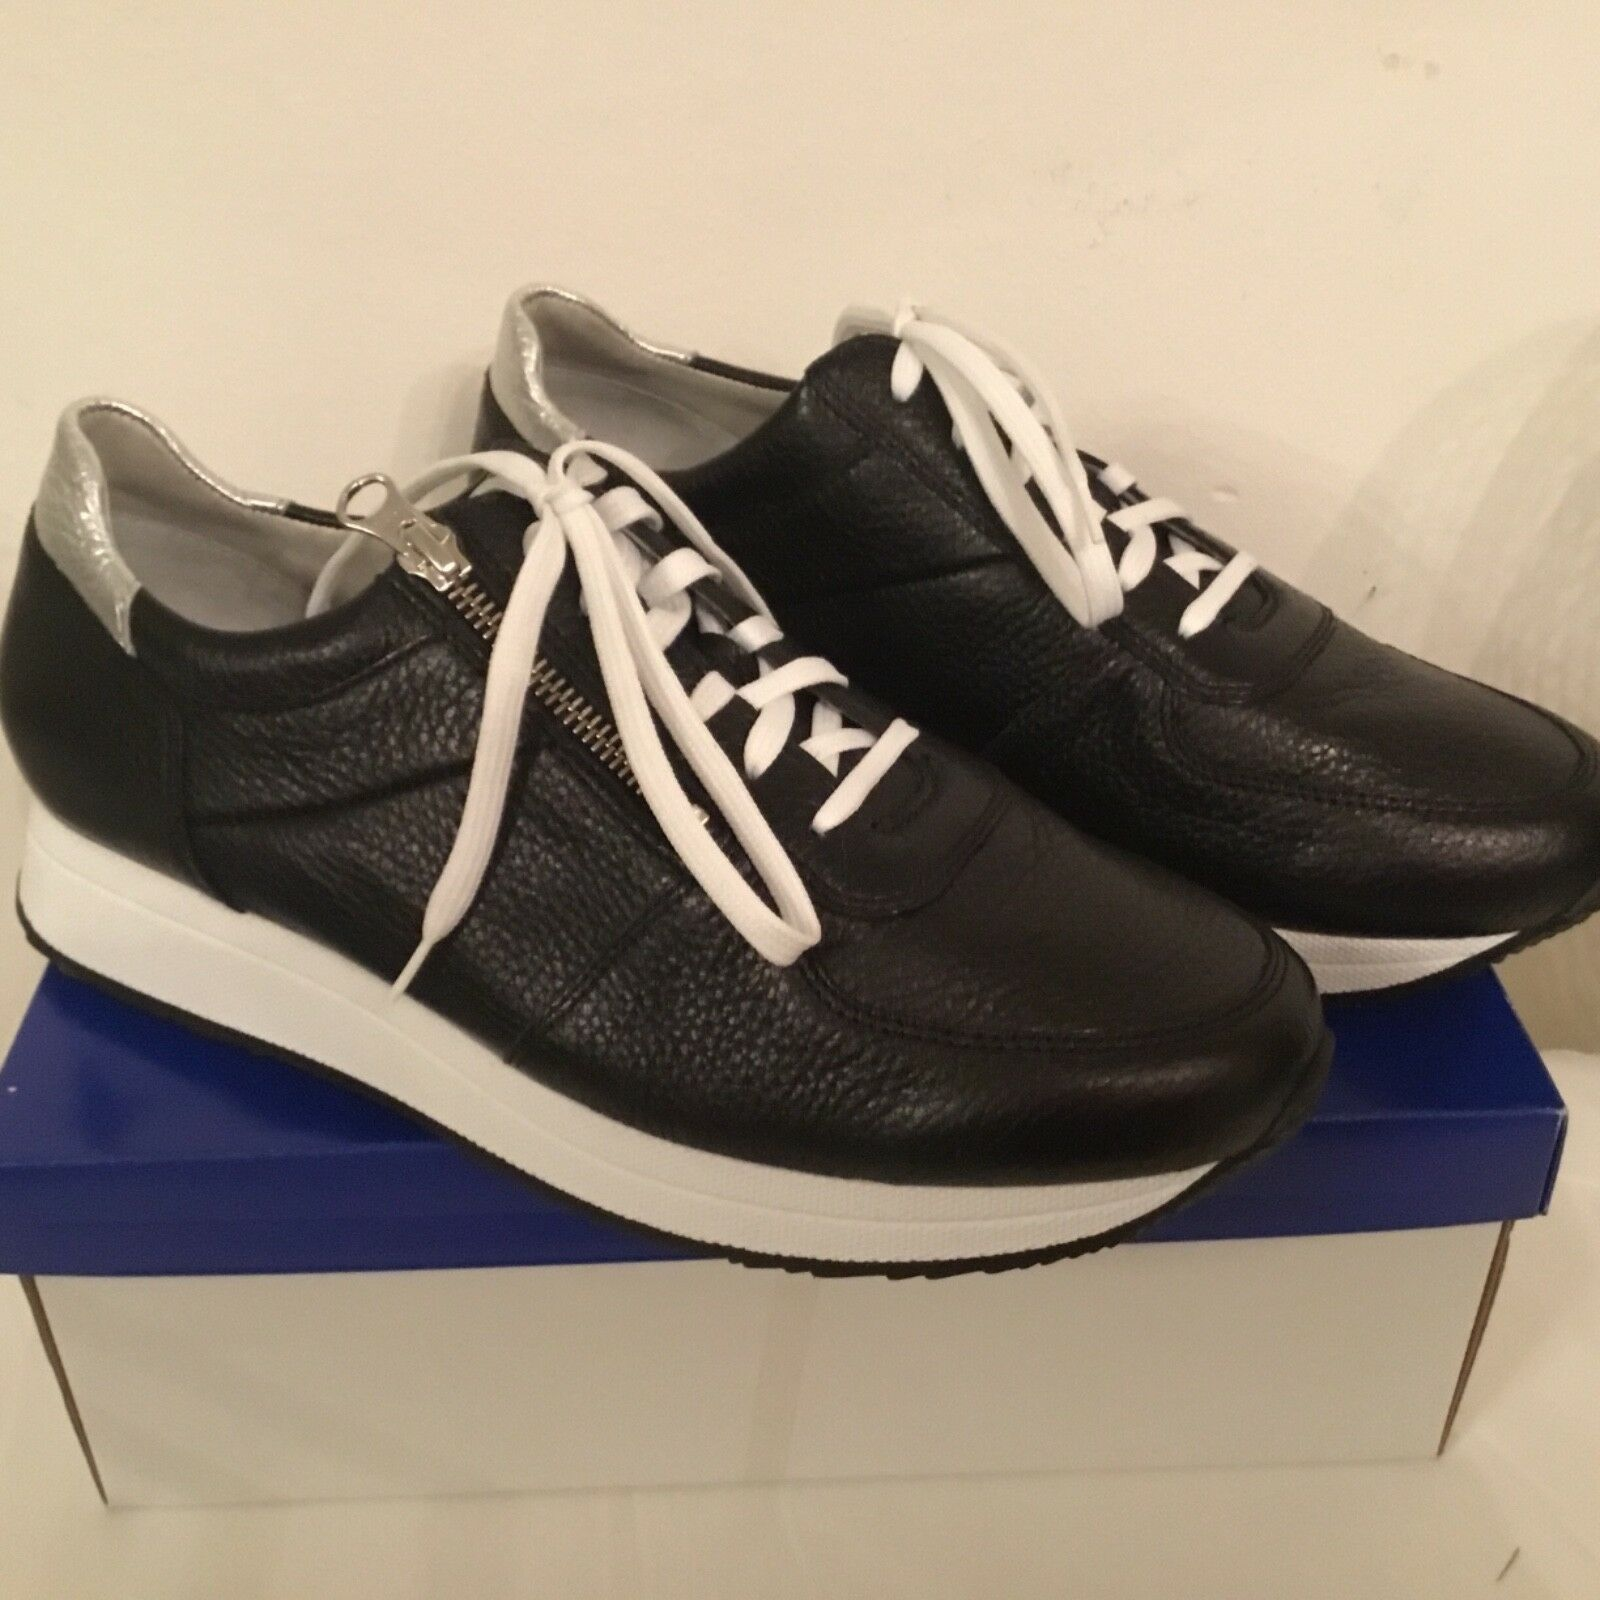 Vitaform DAMEN-Sneaker Real Leather Mesh Inserts Hand Sole - Black